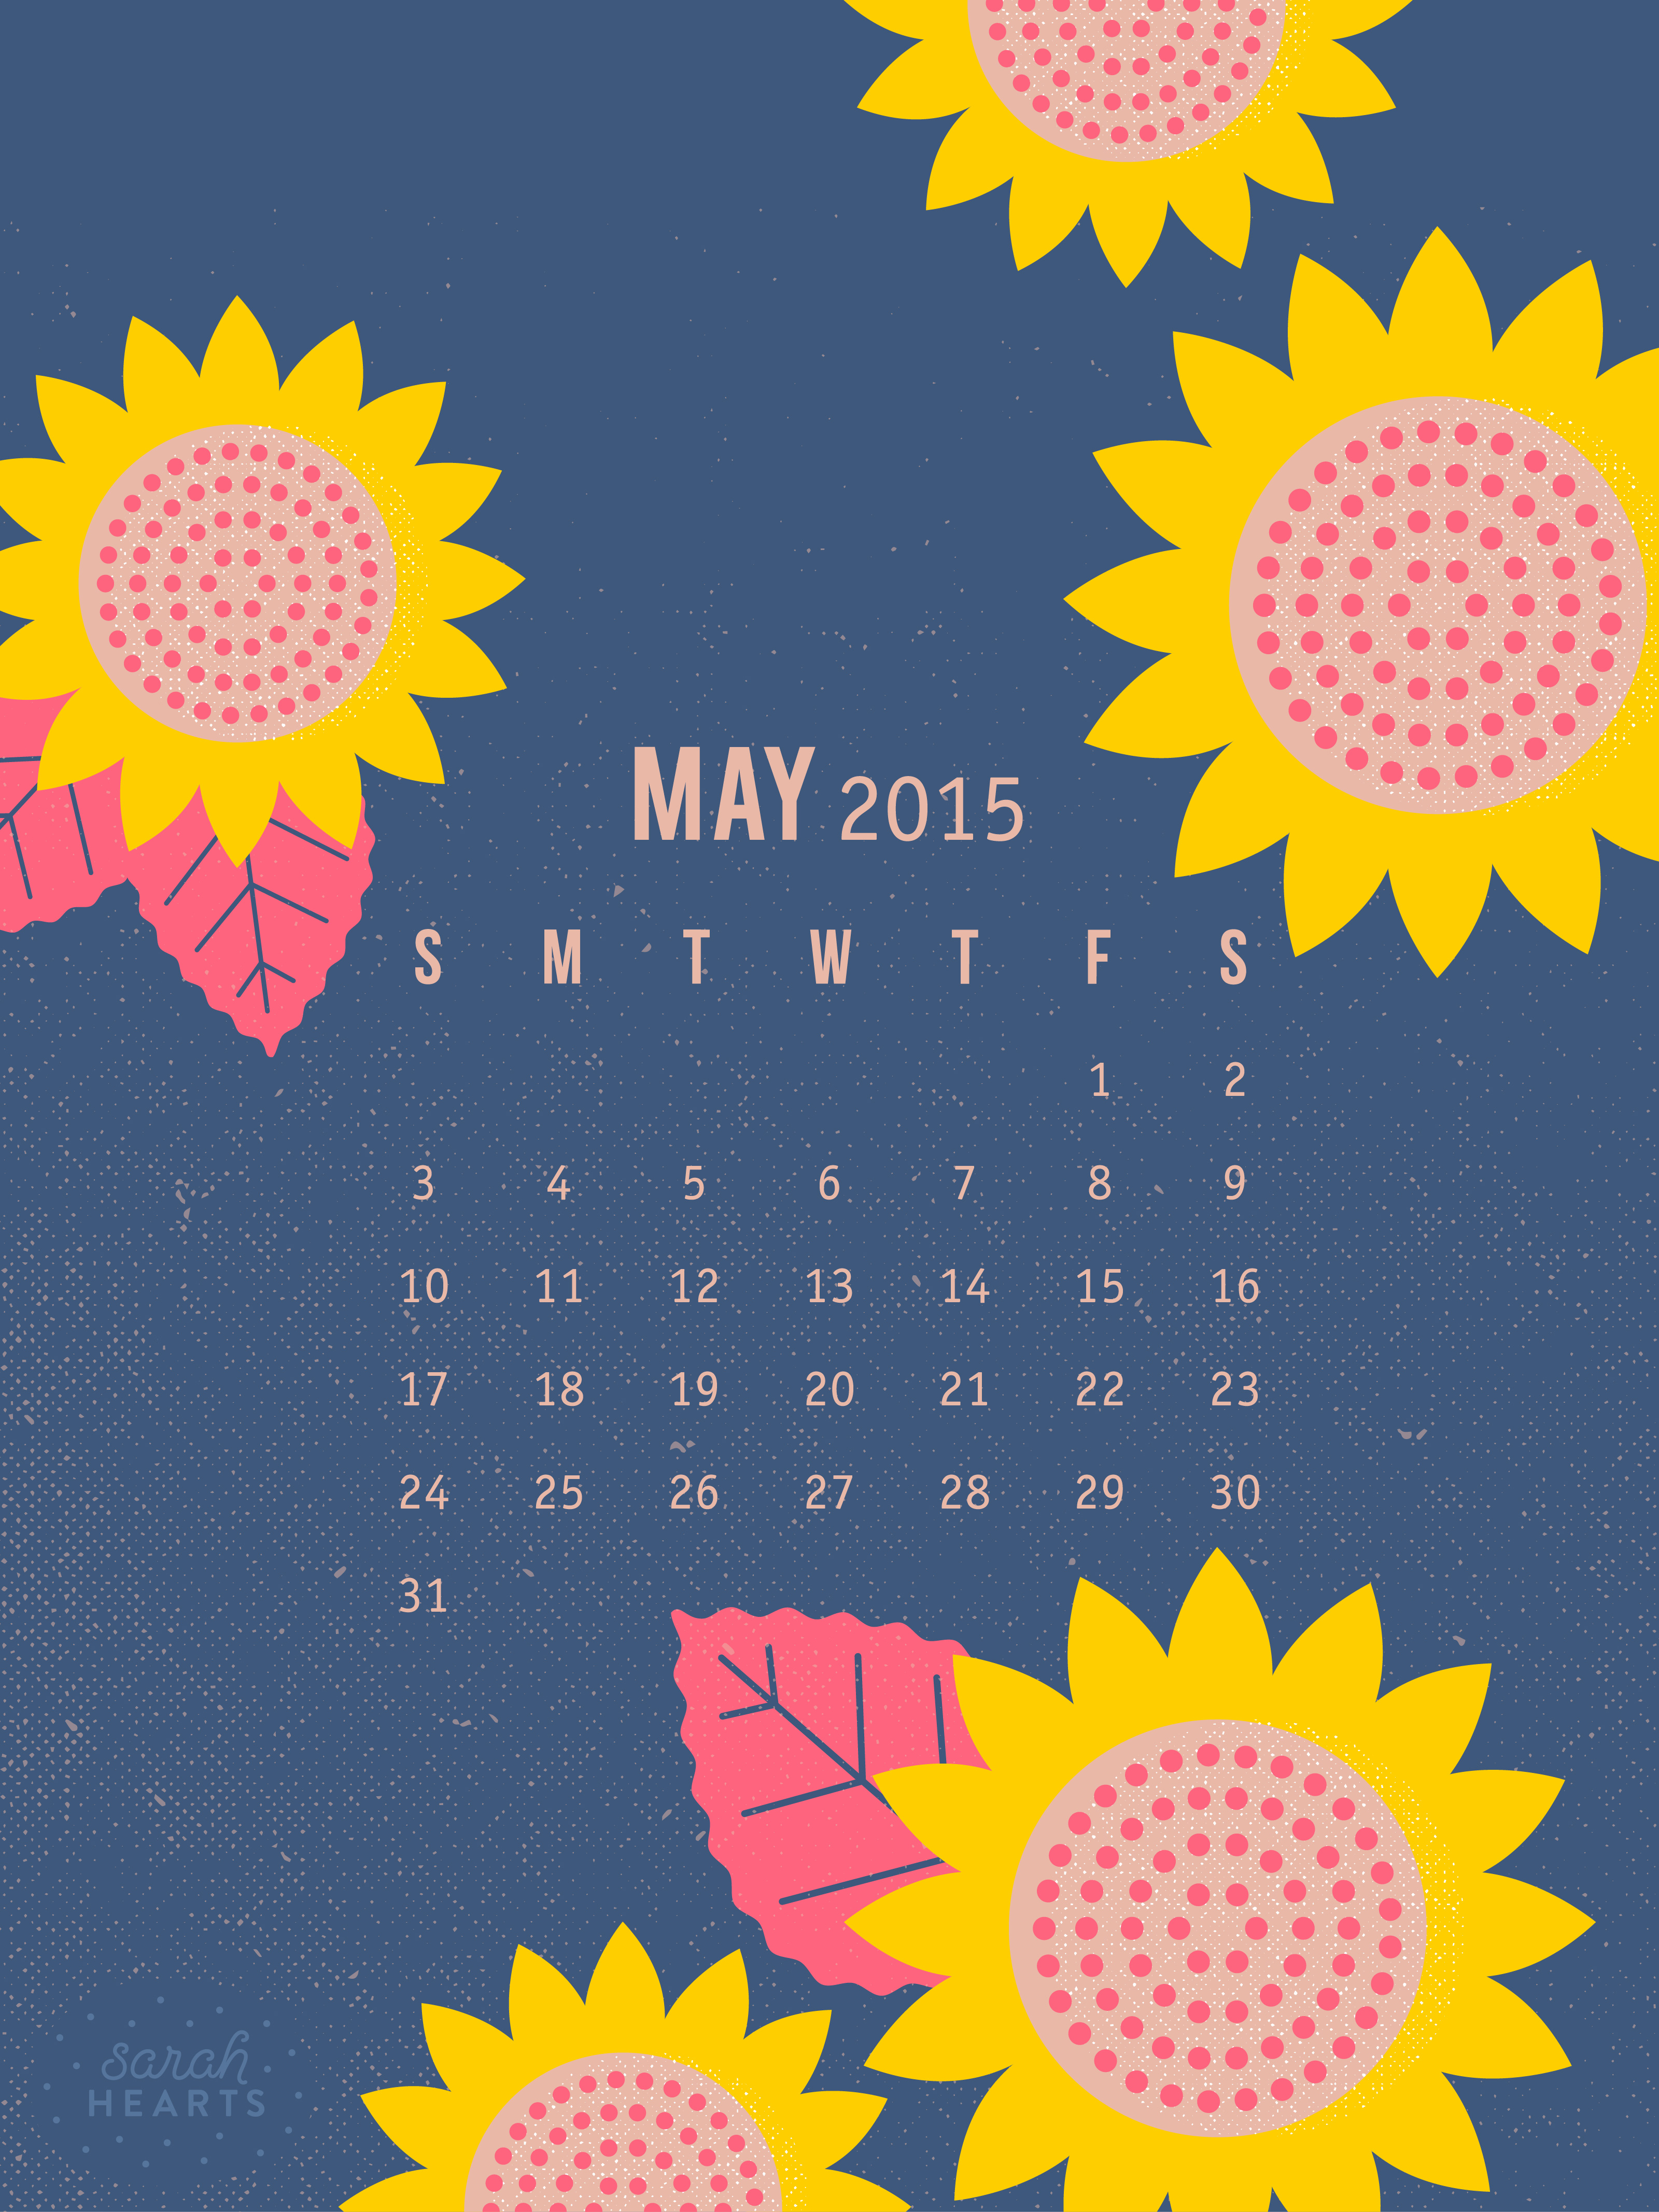 may 2015 calendar wallpaper